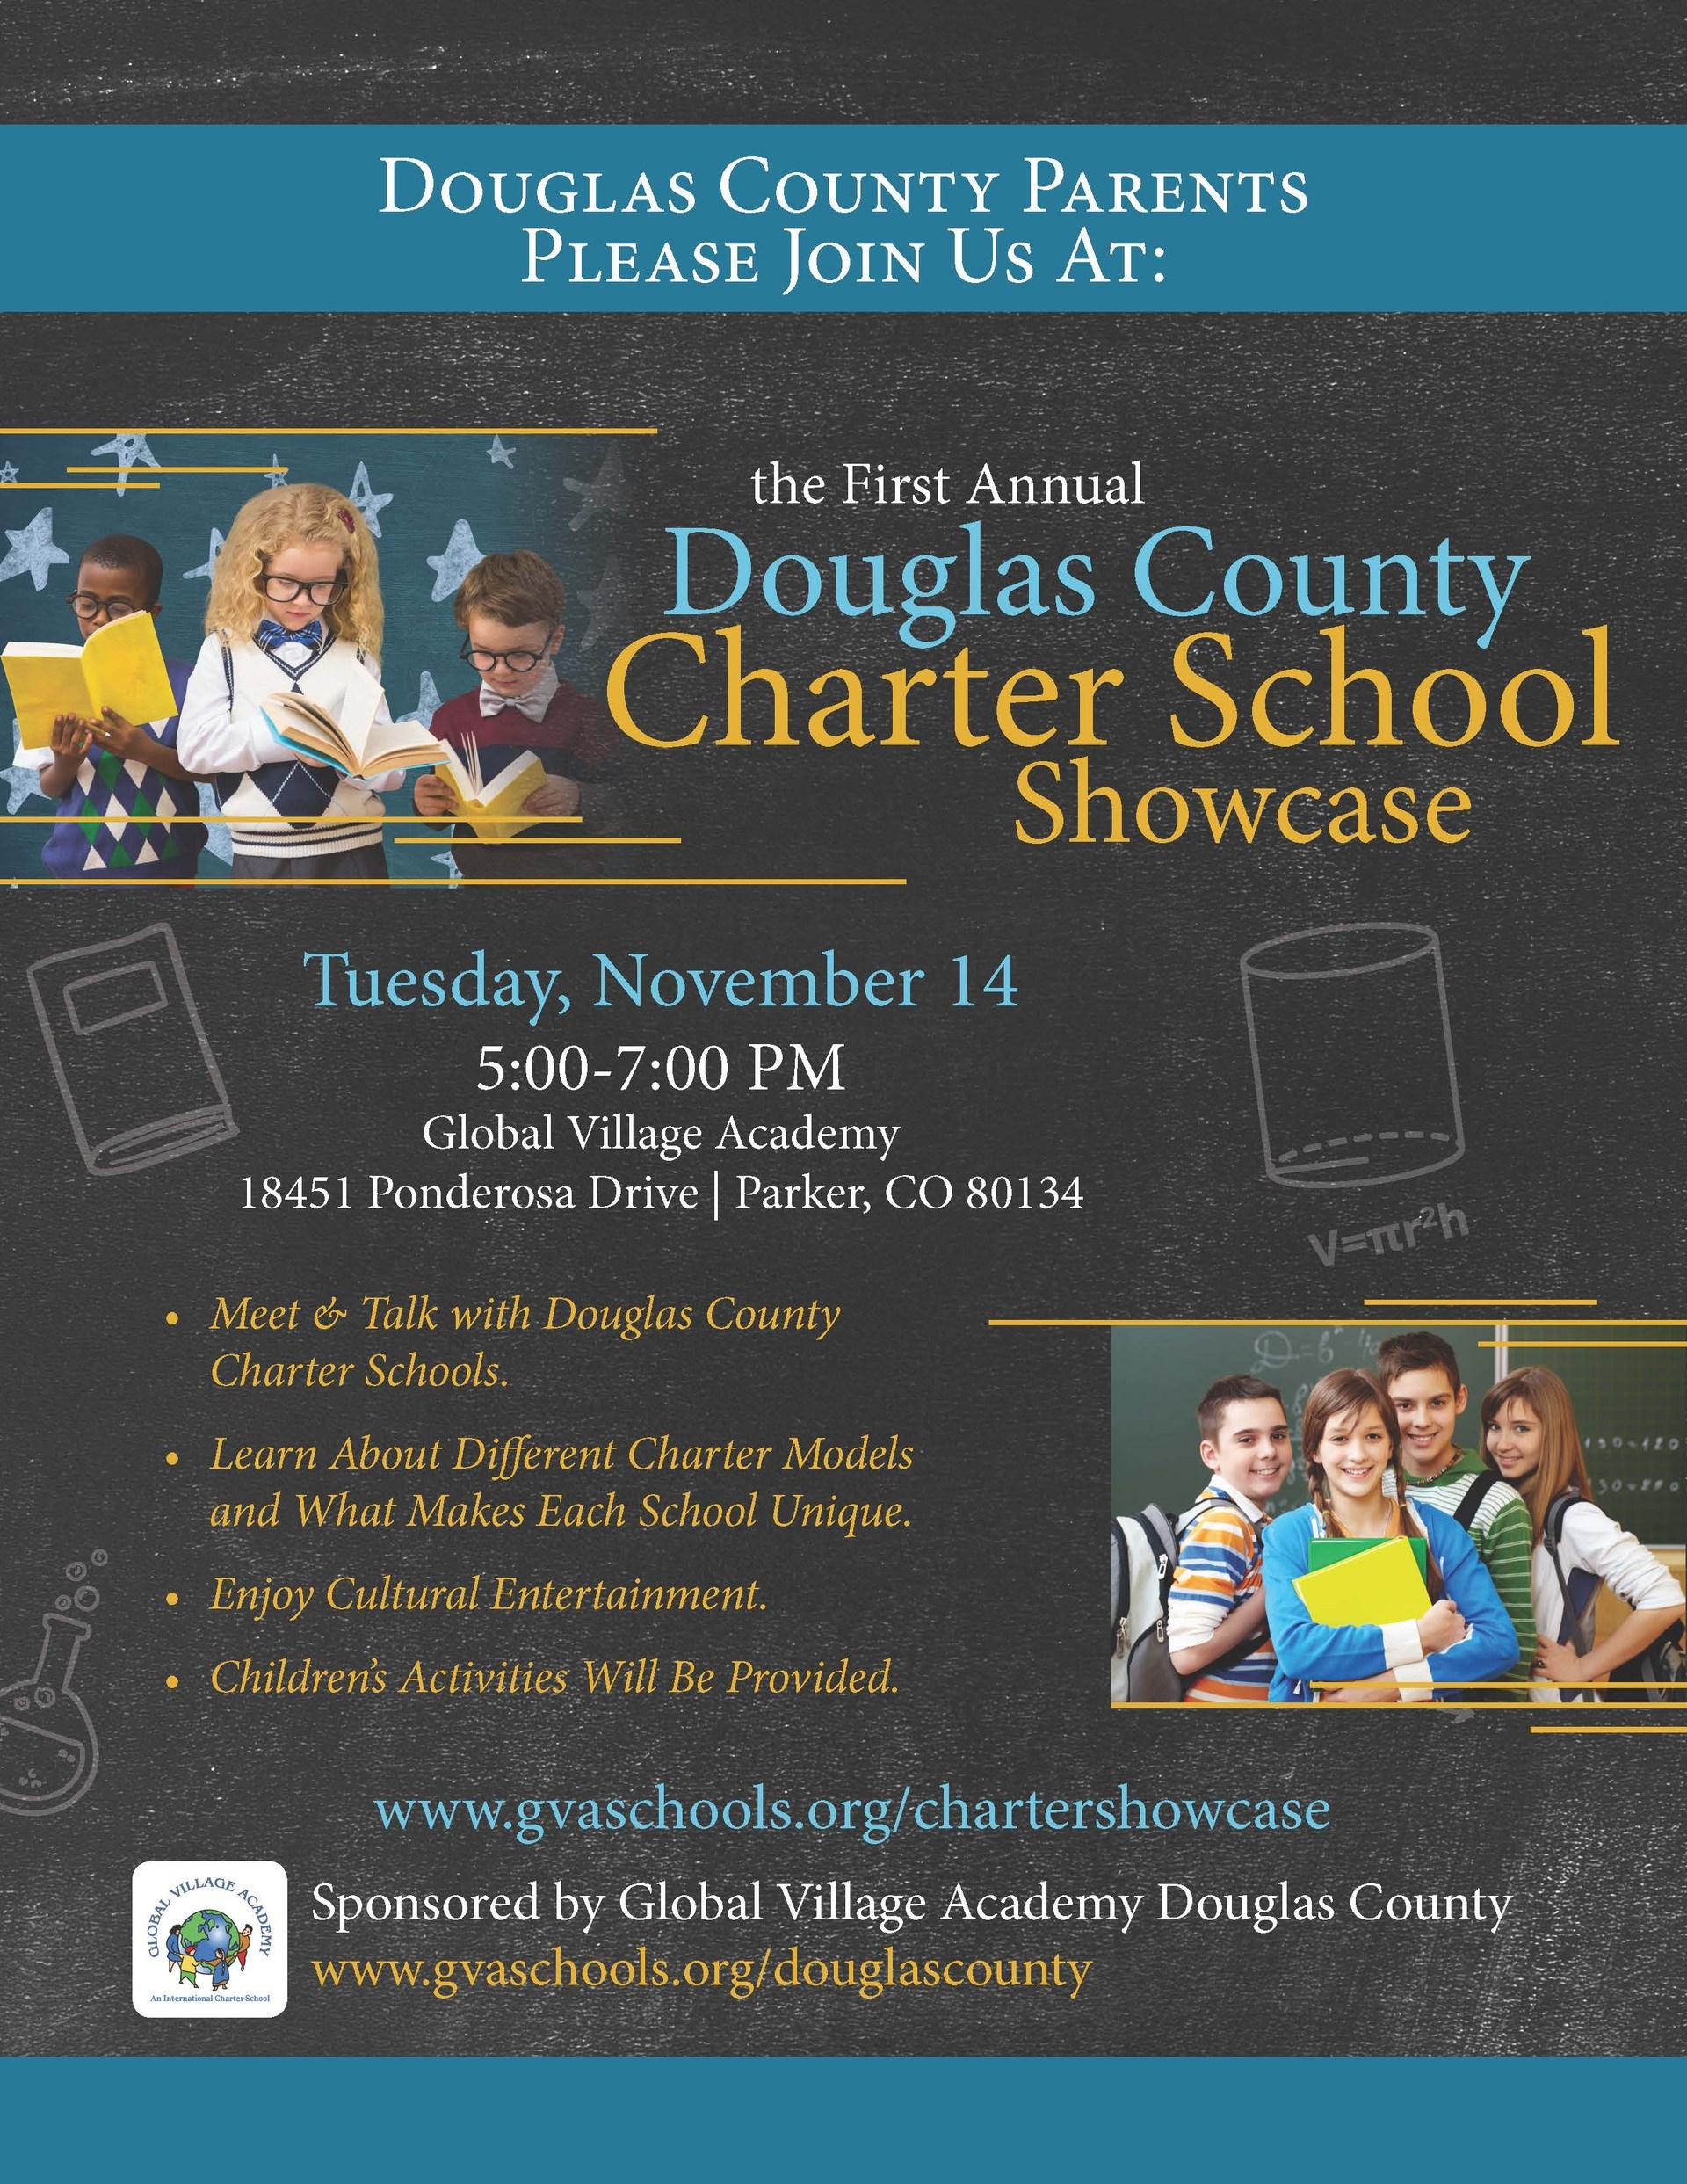 douglas county charter showcase flyer